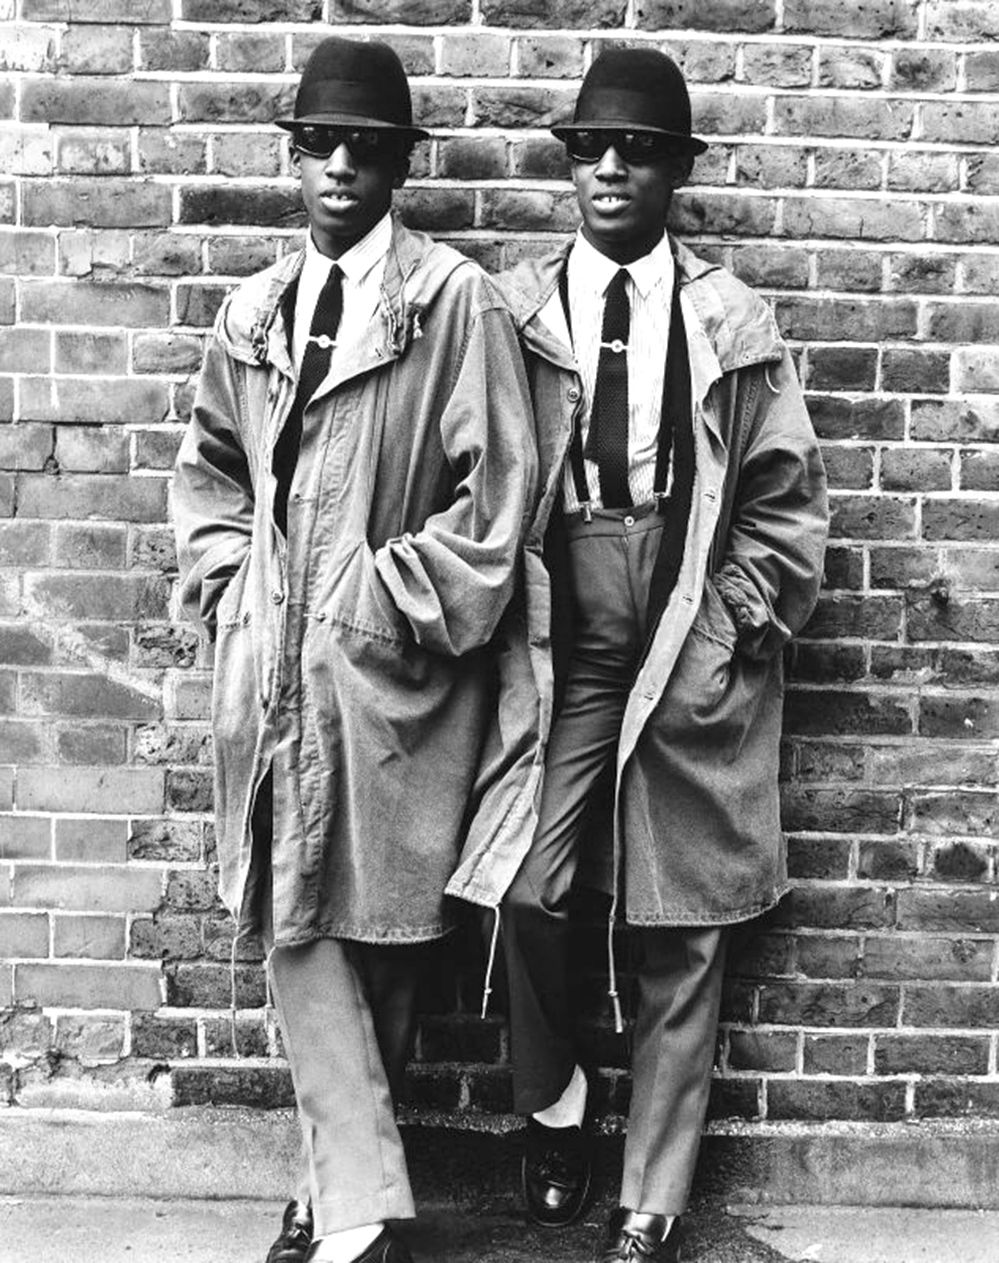 1960s rude boys